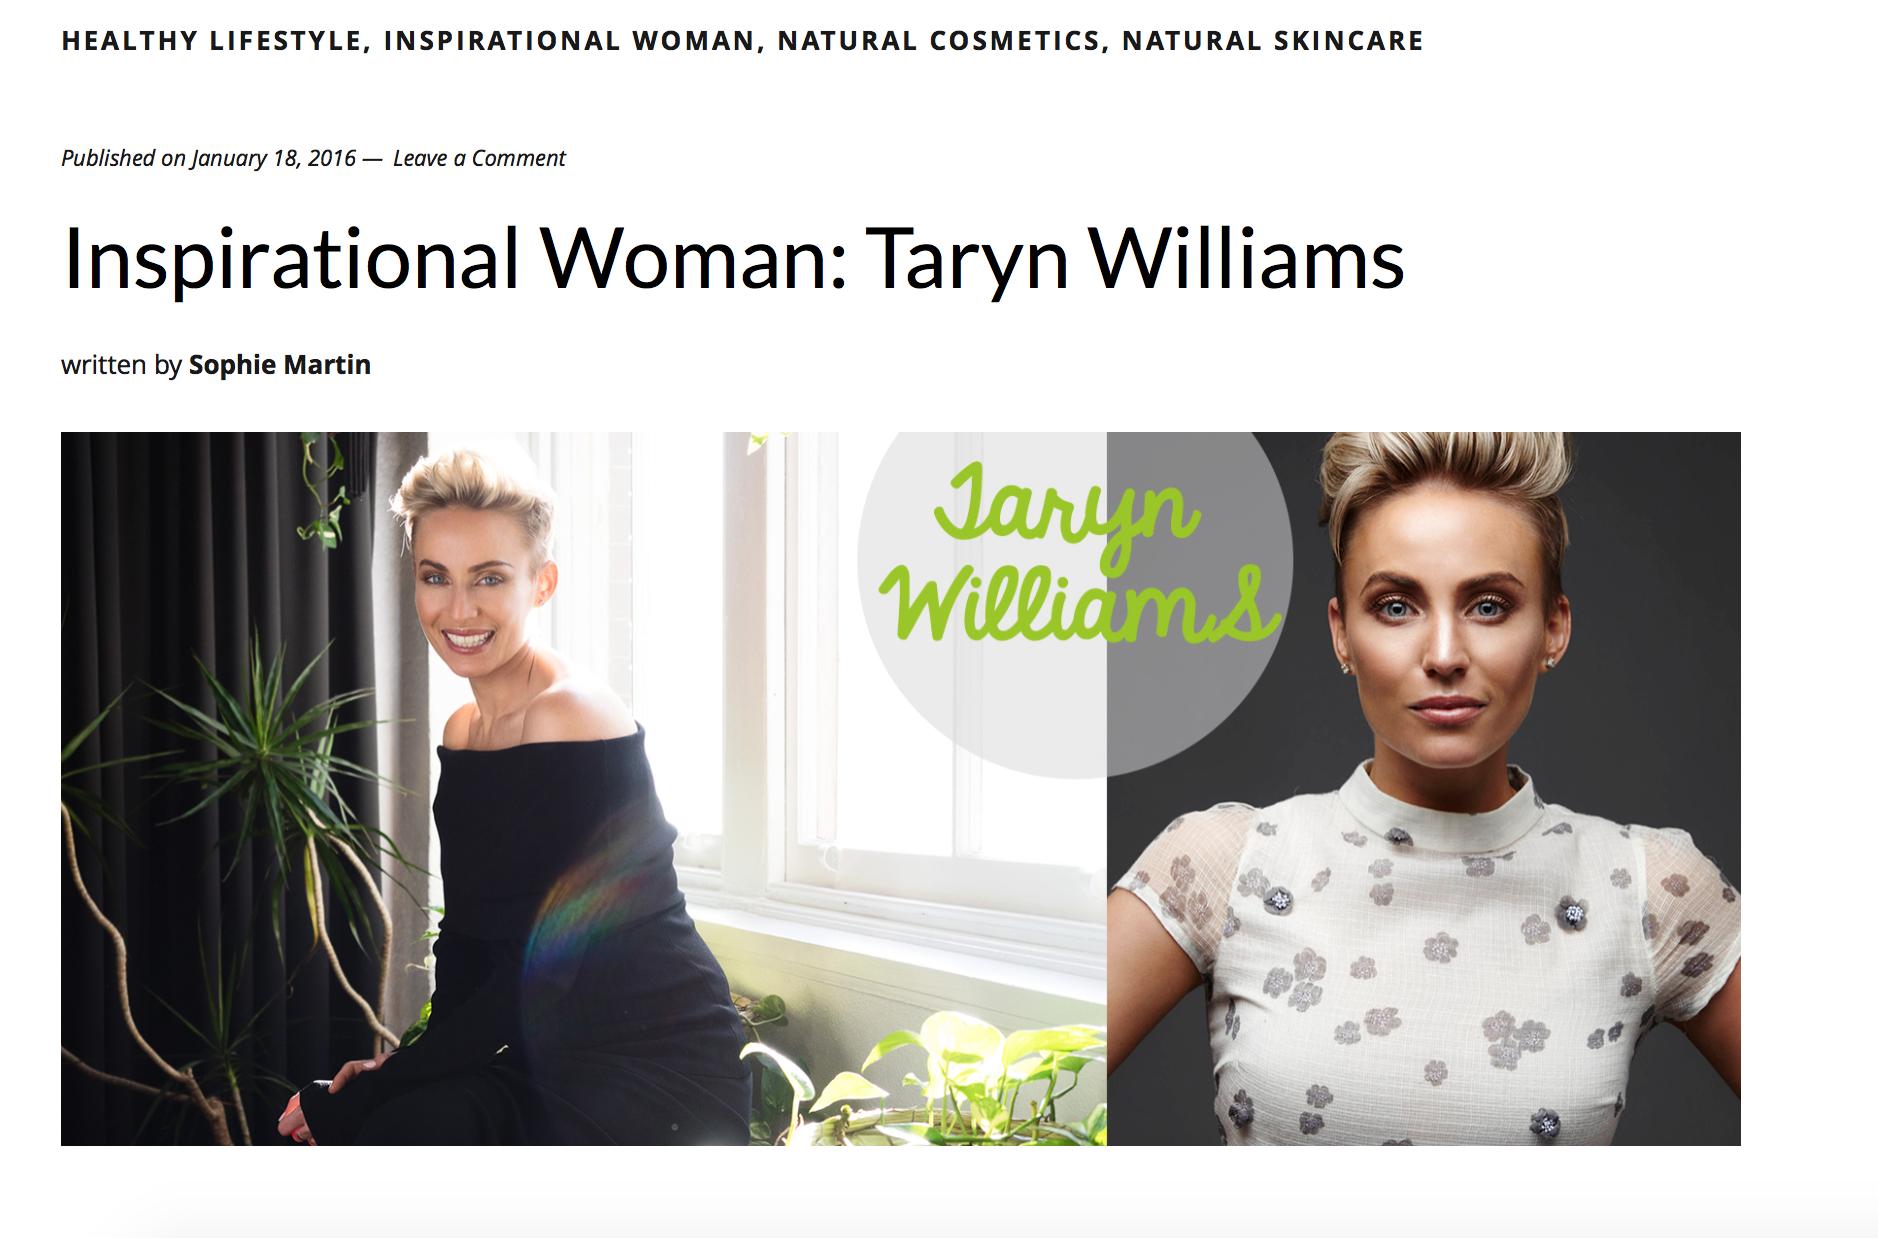 https://erepereznaturallybeautiful.com/2016/01/18/inspirational-woman-taryn-williams/